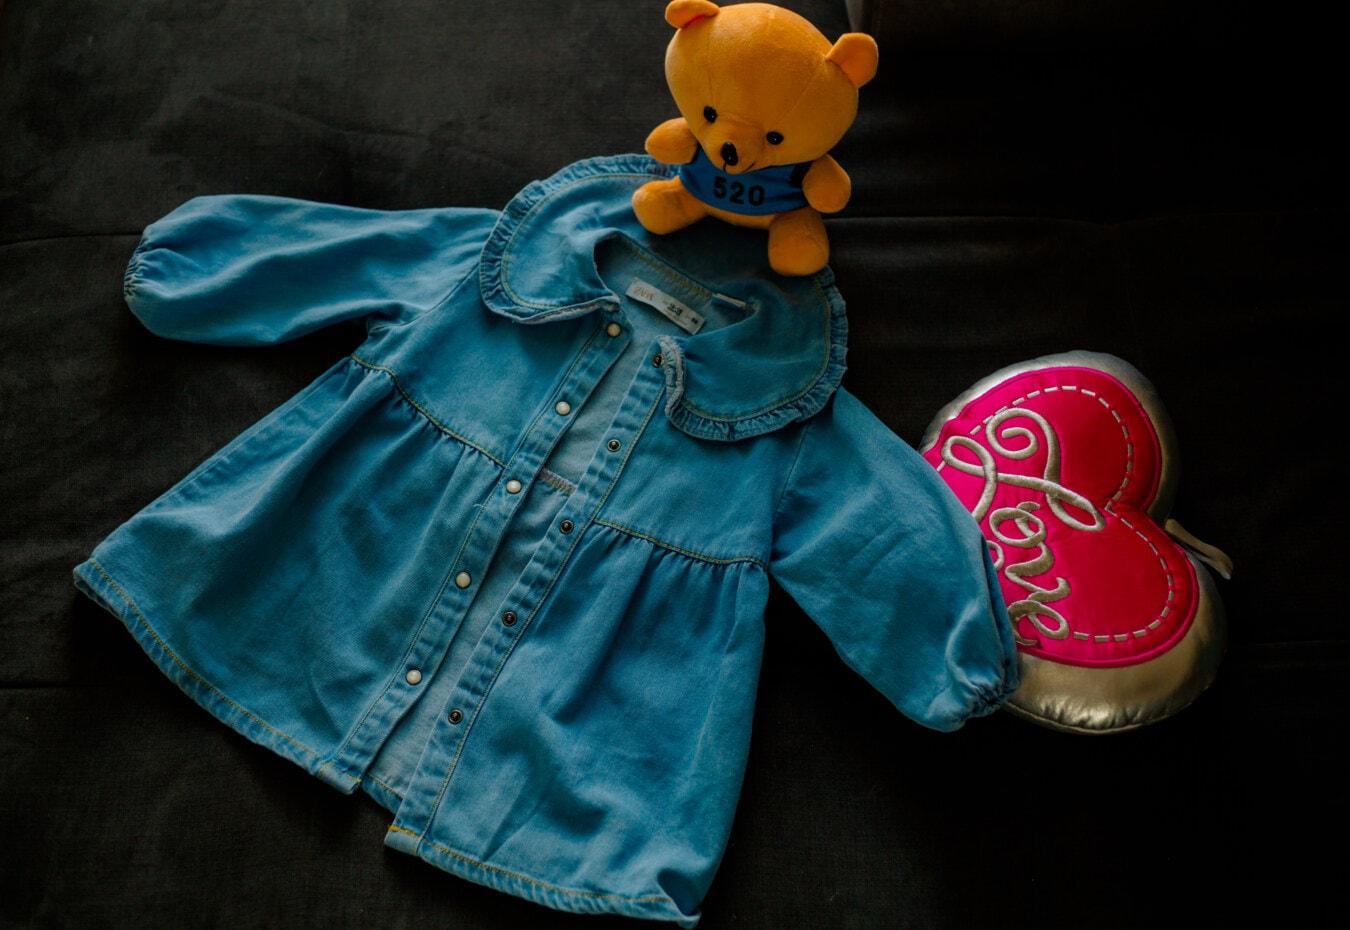 bamse leketøy, leker, hjerte, jakke, jeans, liten, barn, mote, farge, Baby